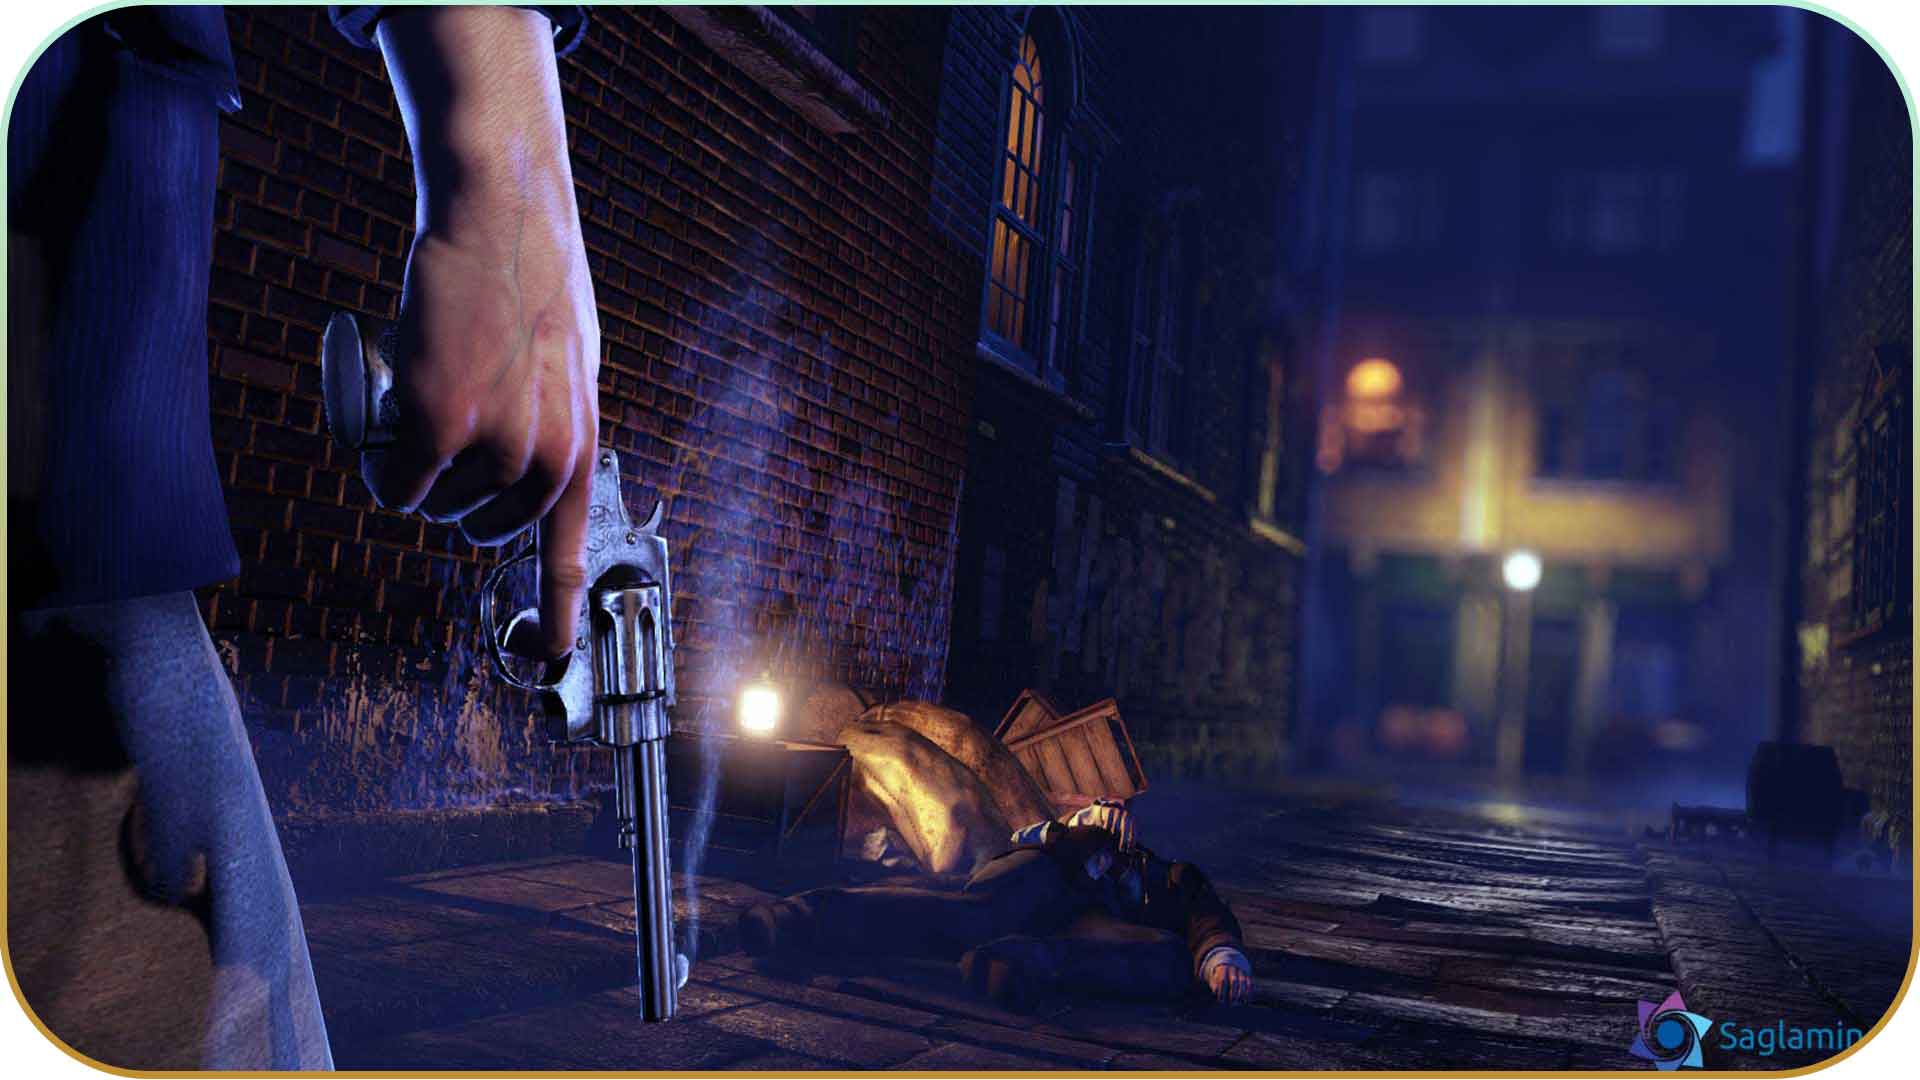 Sherlock Holmes Crimes and Punishments saglamindir